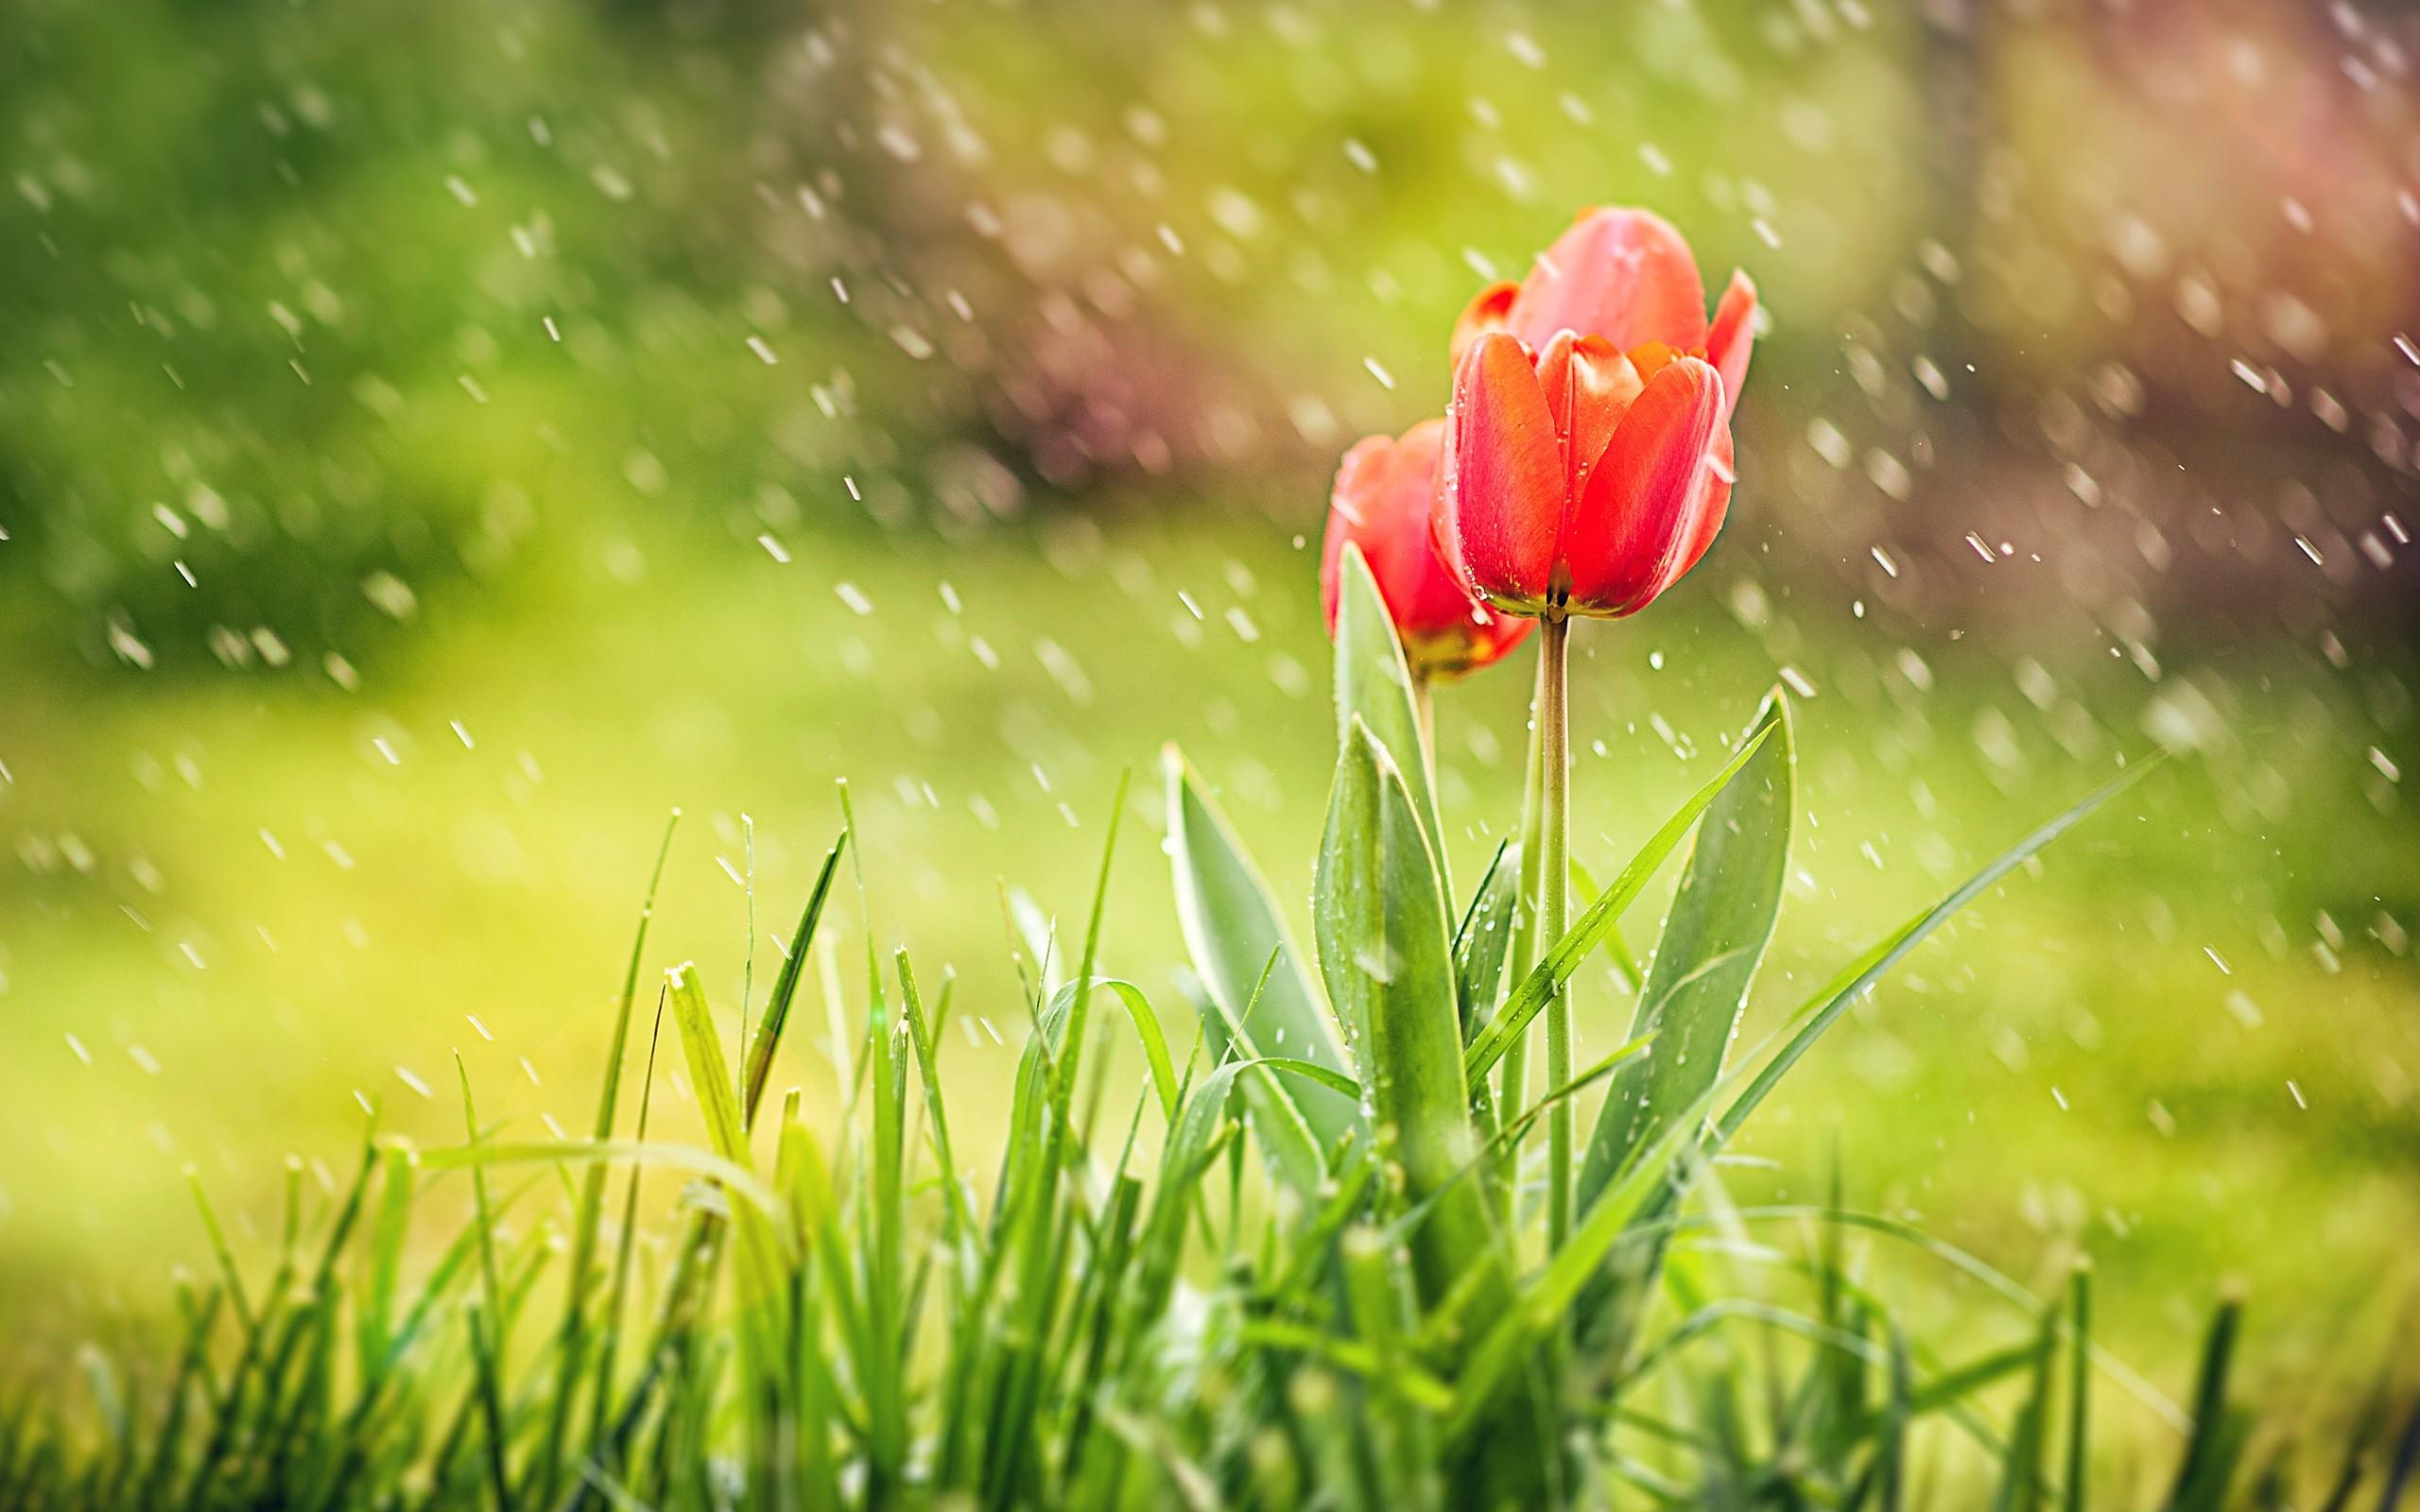 Raindrop Wallpaper Iphone X April Showers Wallpaper 56 Images